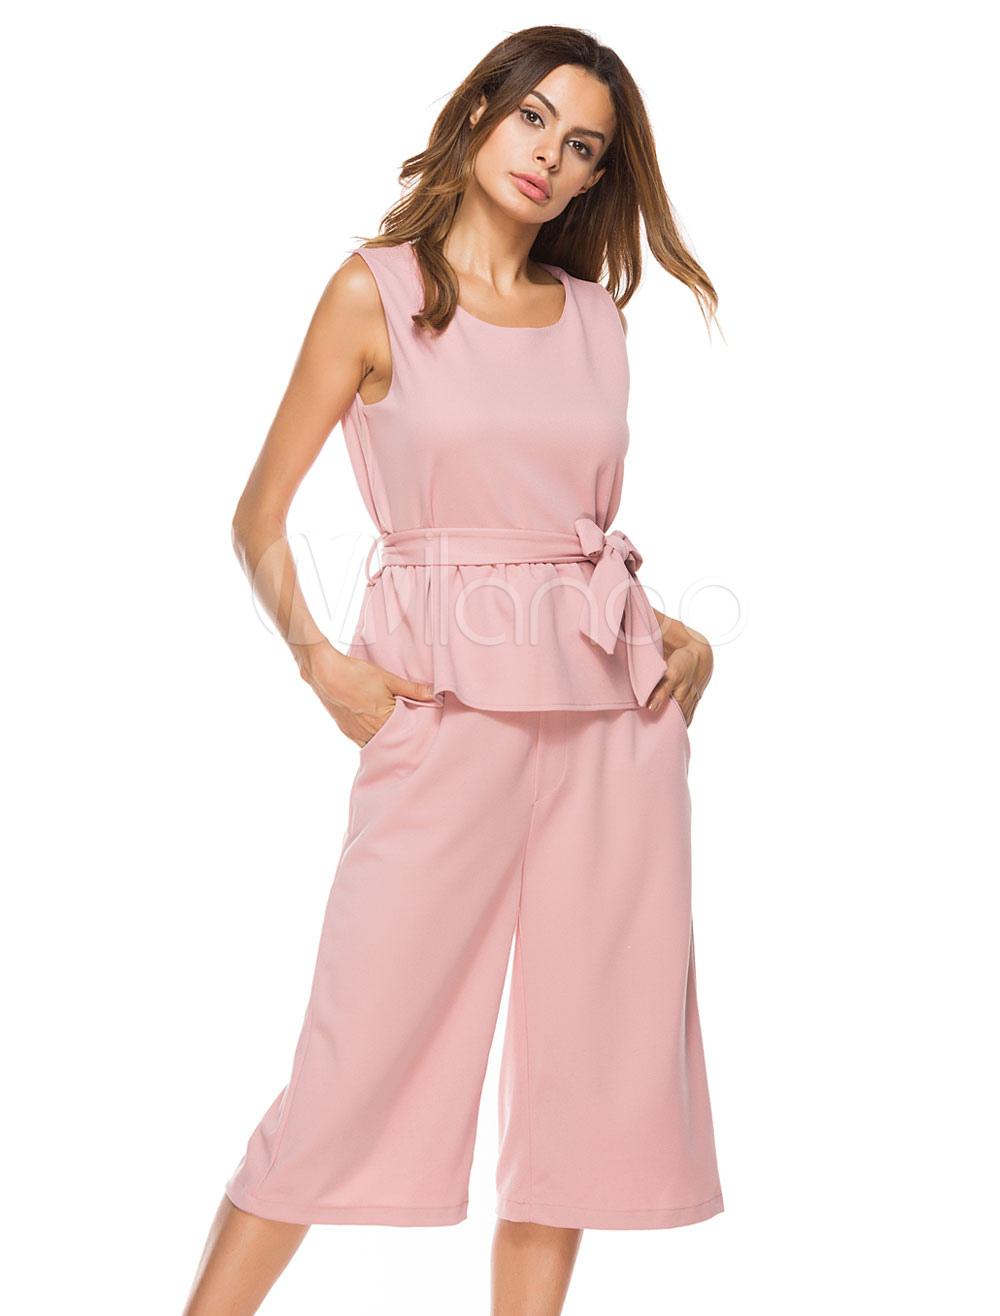 Women Pants Set Sleeveless Sash Pink Summer Top With Wide Leg Pants